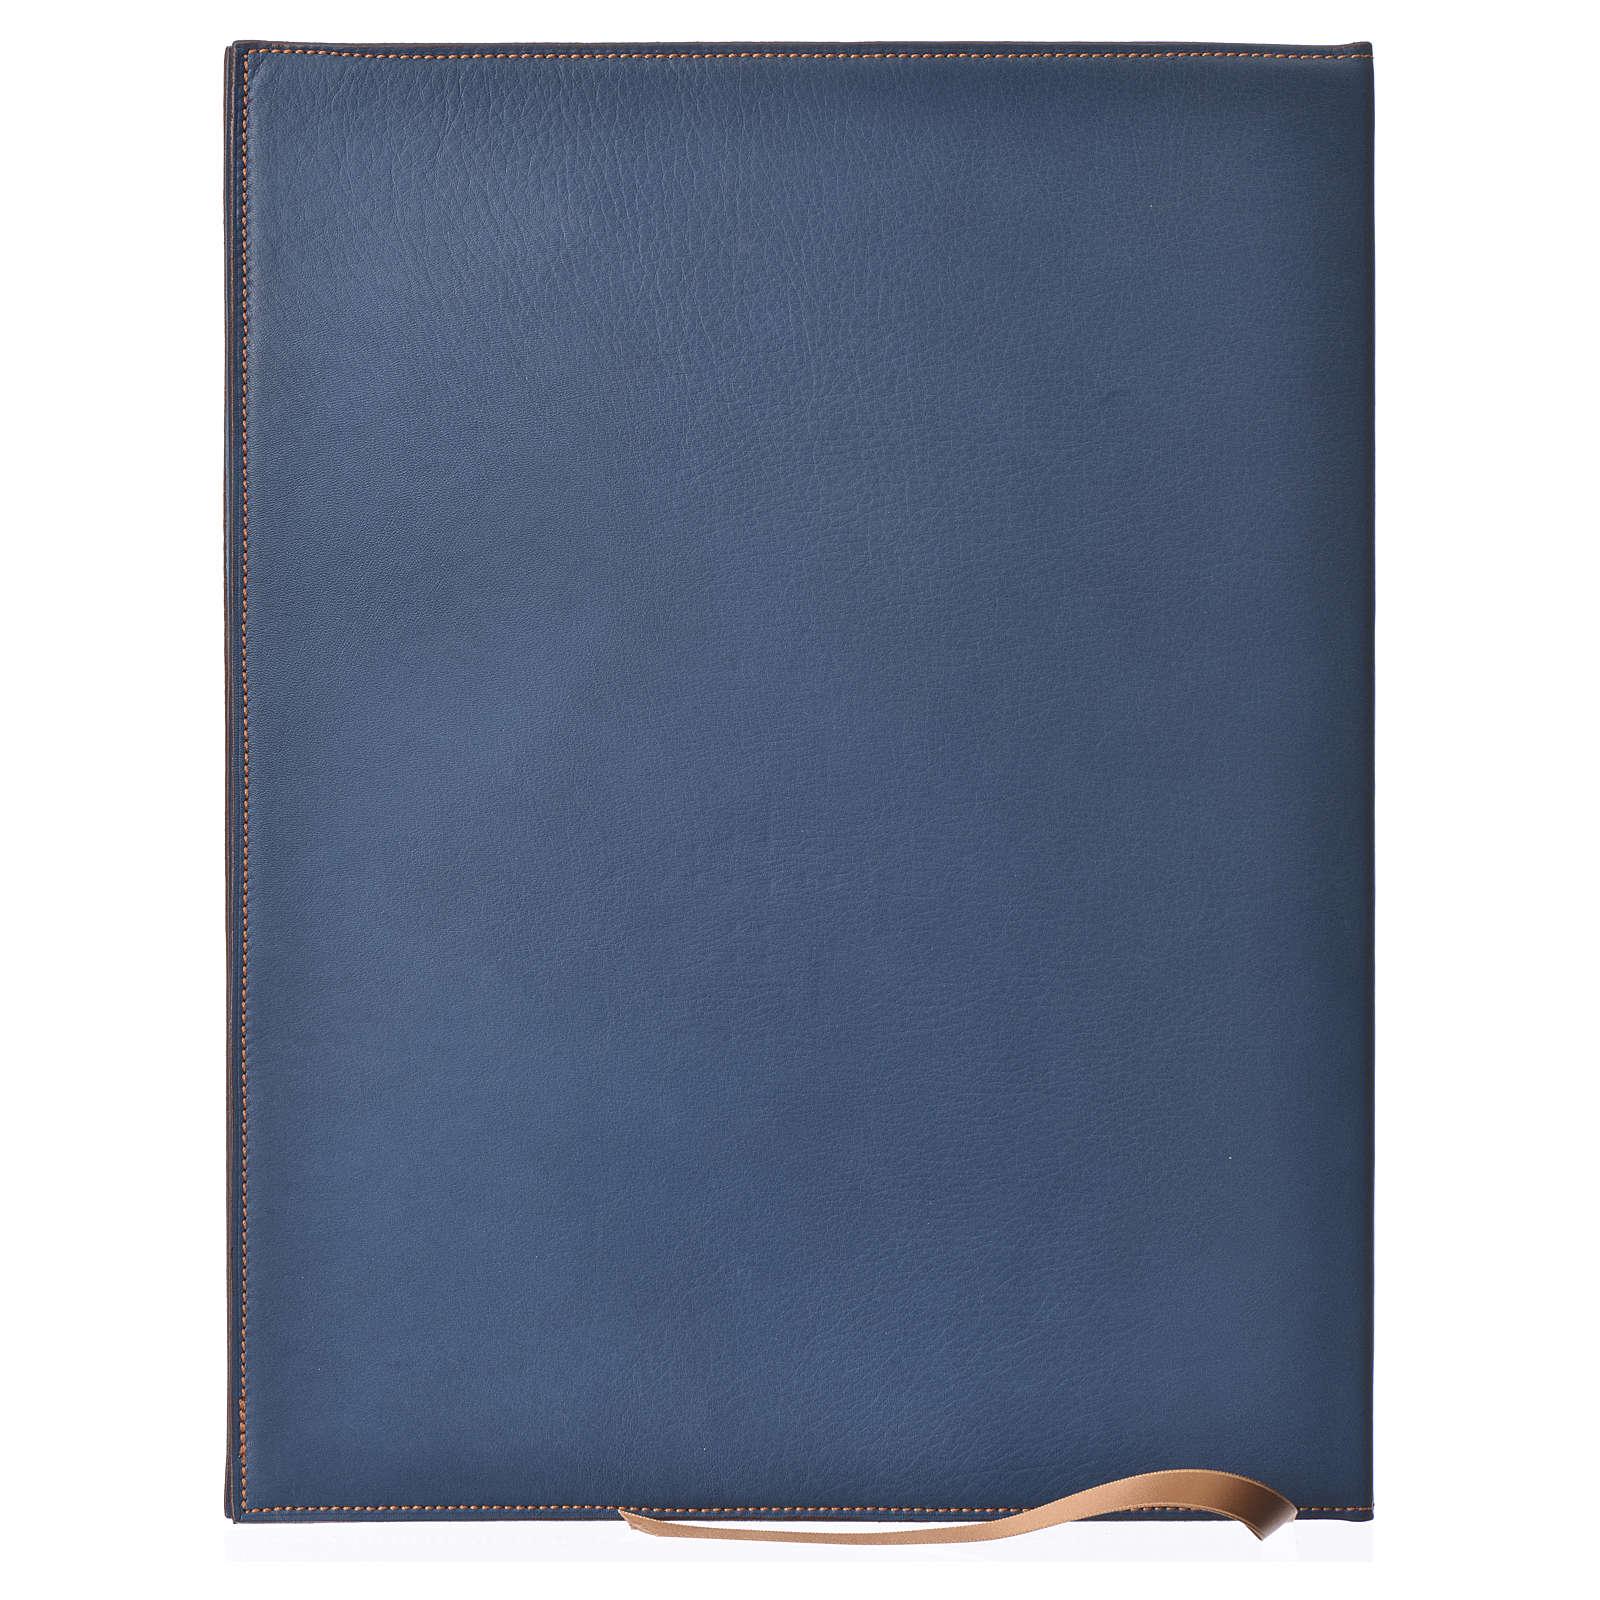 Folder for sacred rites in blue leather, hot pressed golden cross Bethleem, A4 size 4